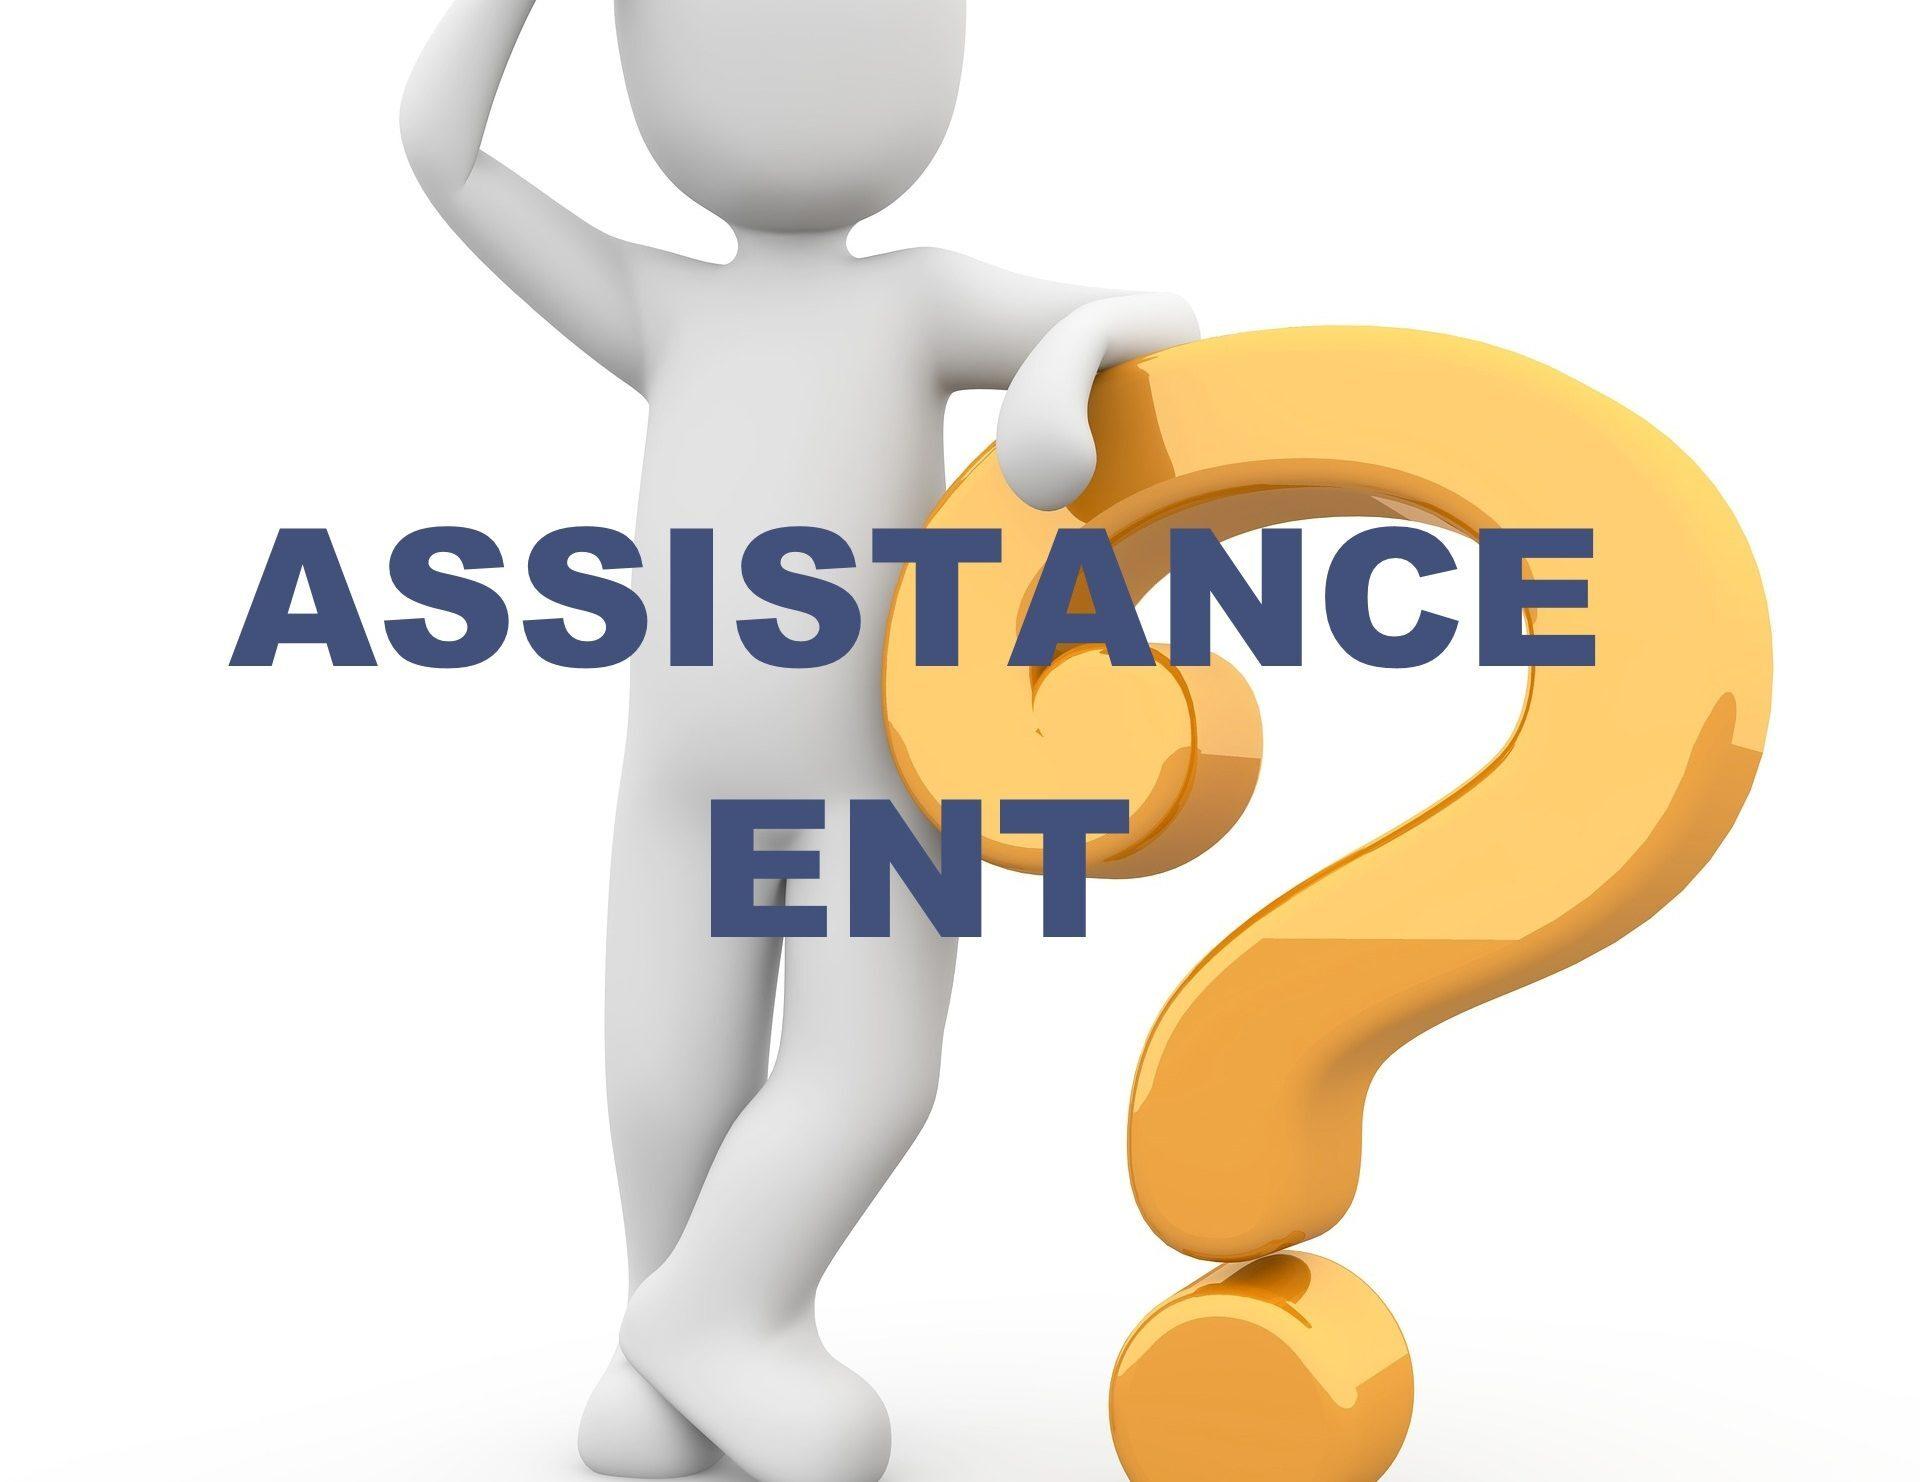 Assistance ENT.jpg